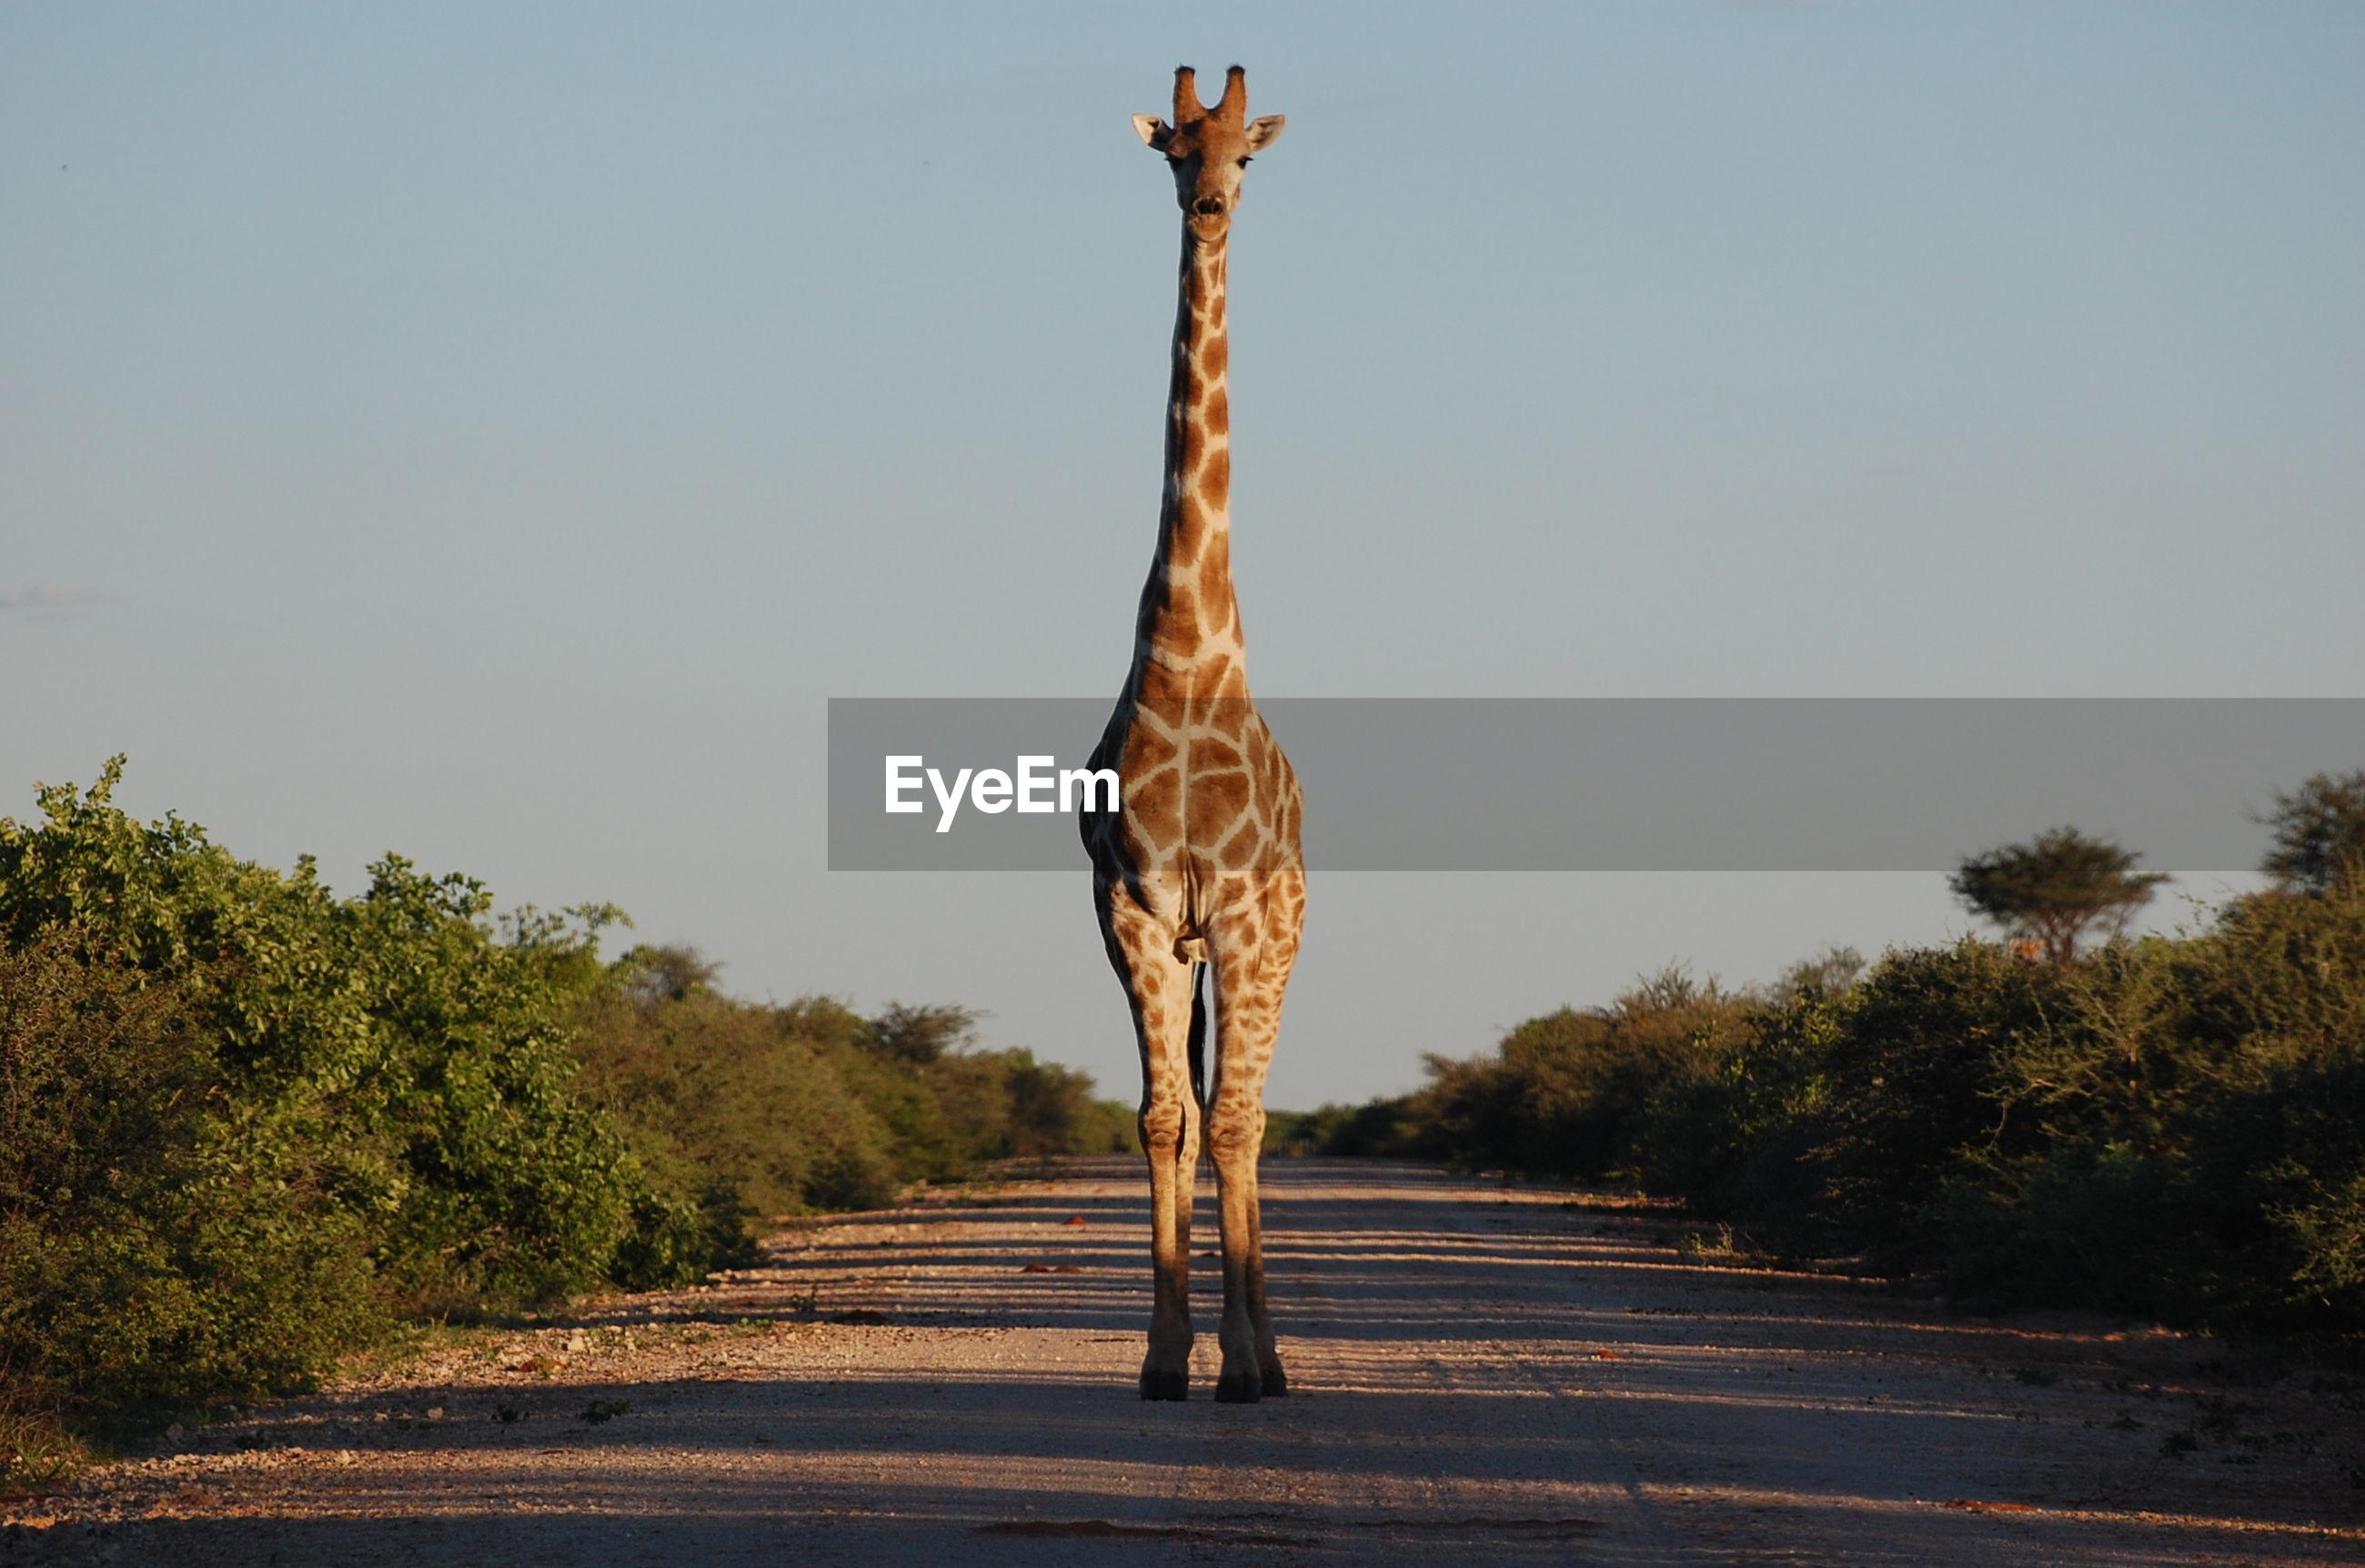 Giraffe standing on dirt road against clear sky